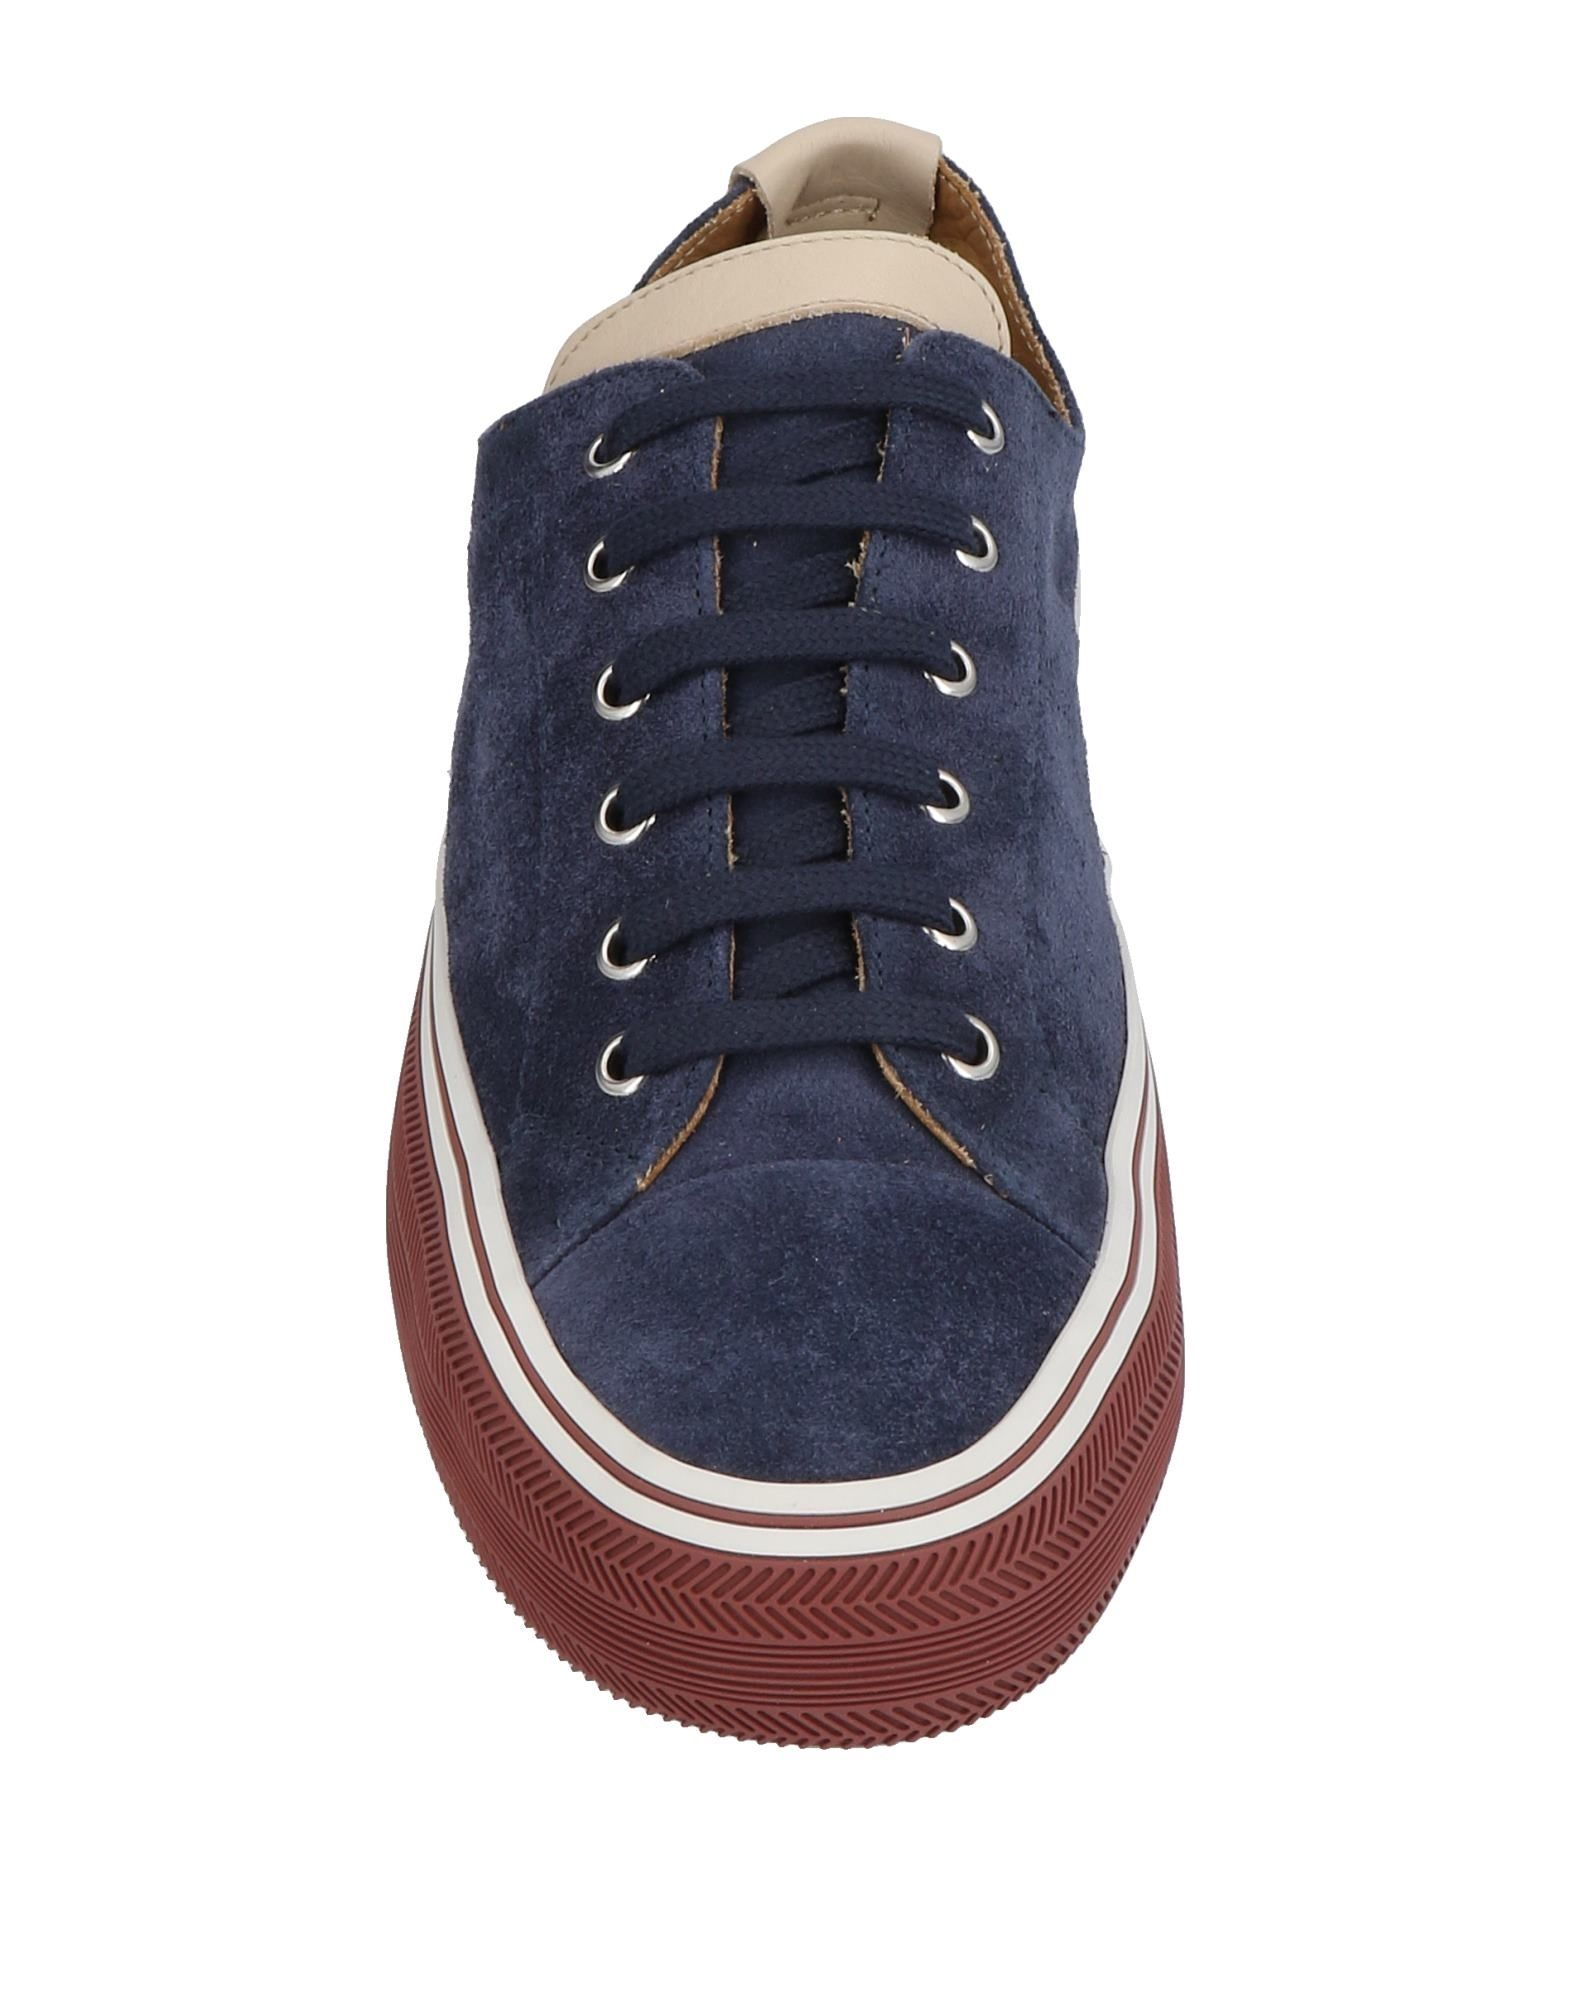 Rabatt echte 11493217PJ Schuhe Pantofola D'oro Sneakers Herren  11493217PJ echte 8913a2